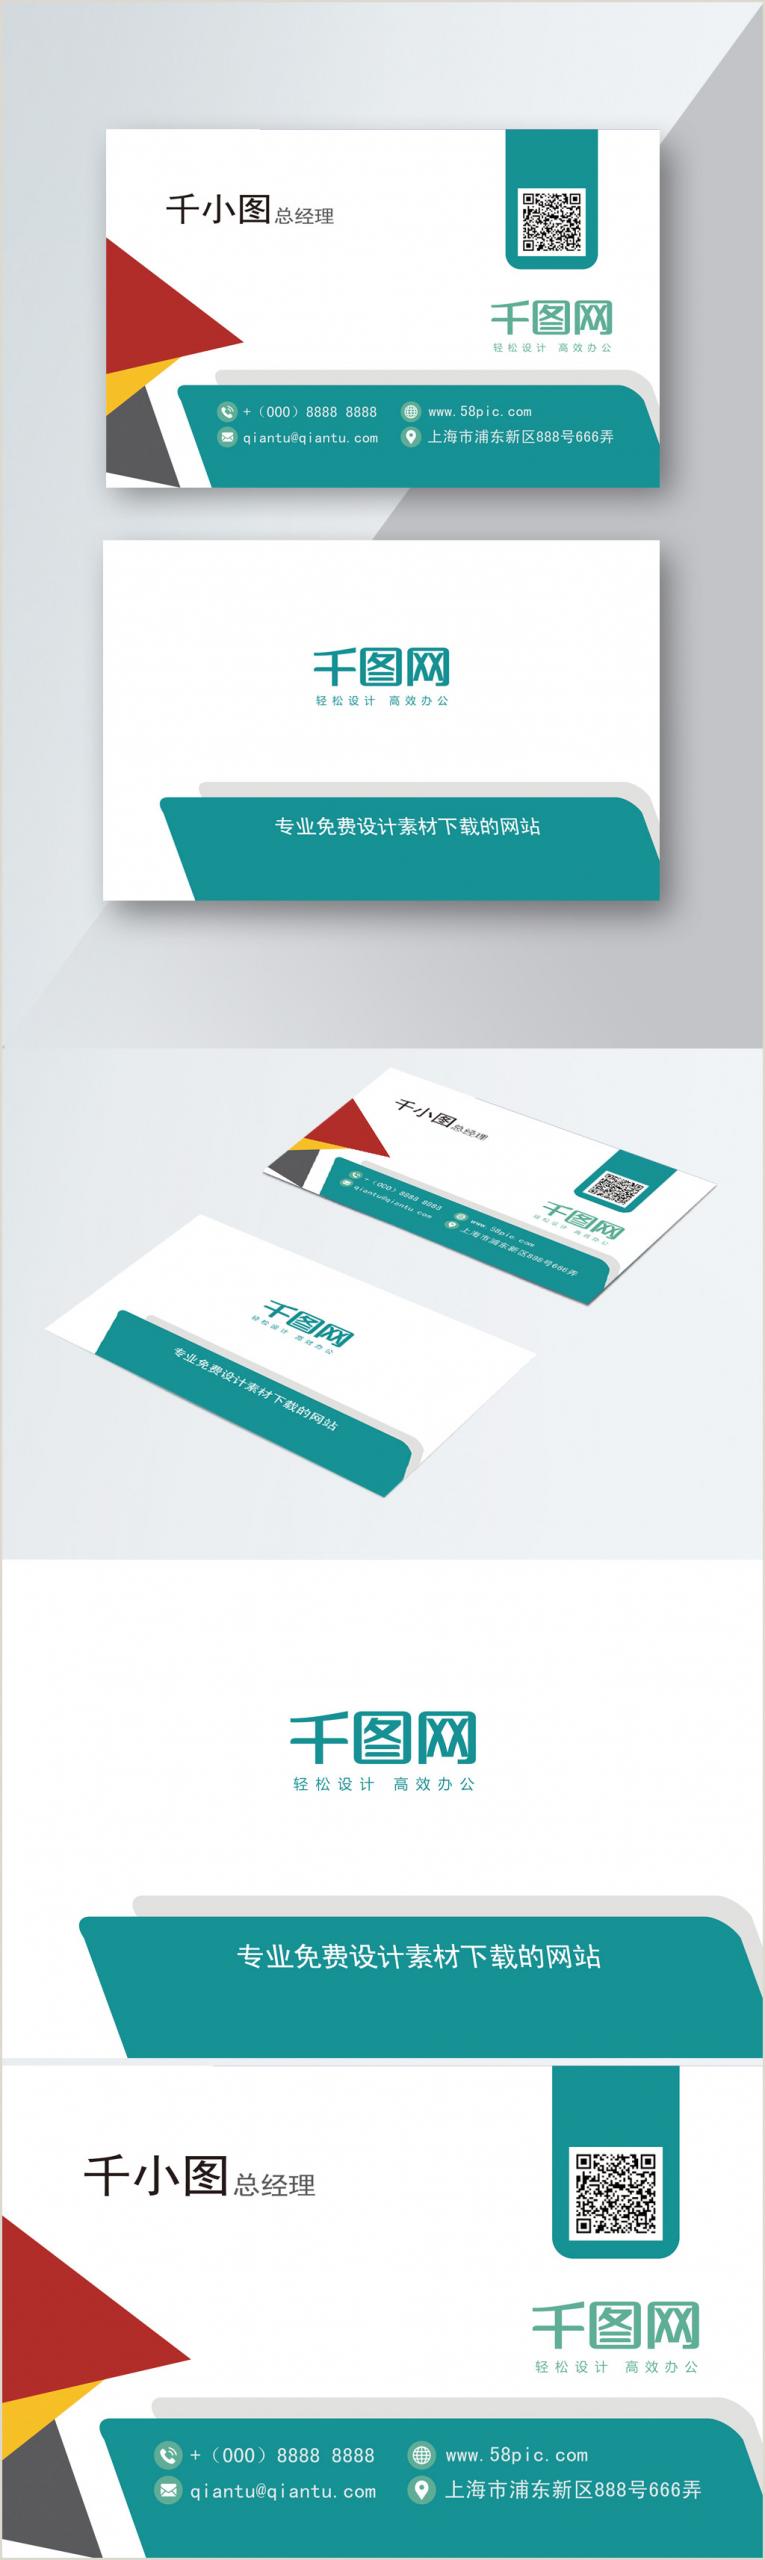 Unique Picture Business Cards Unique Business Card Template Image Picture Free